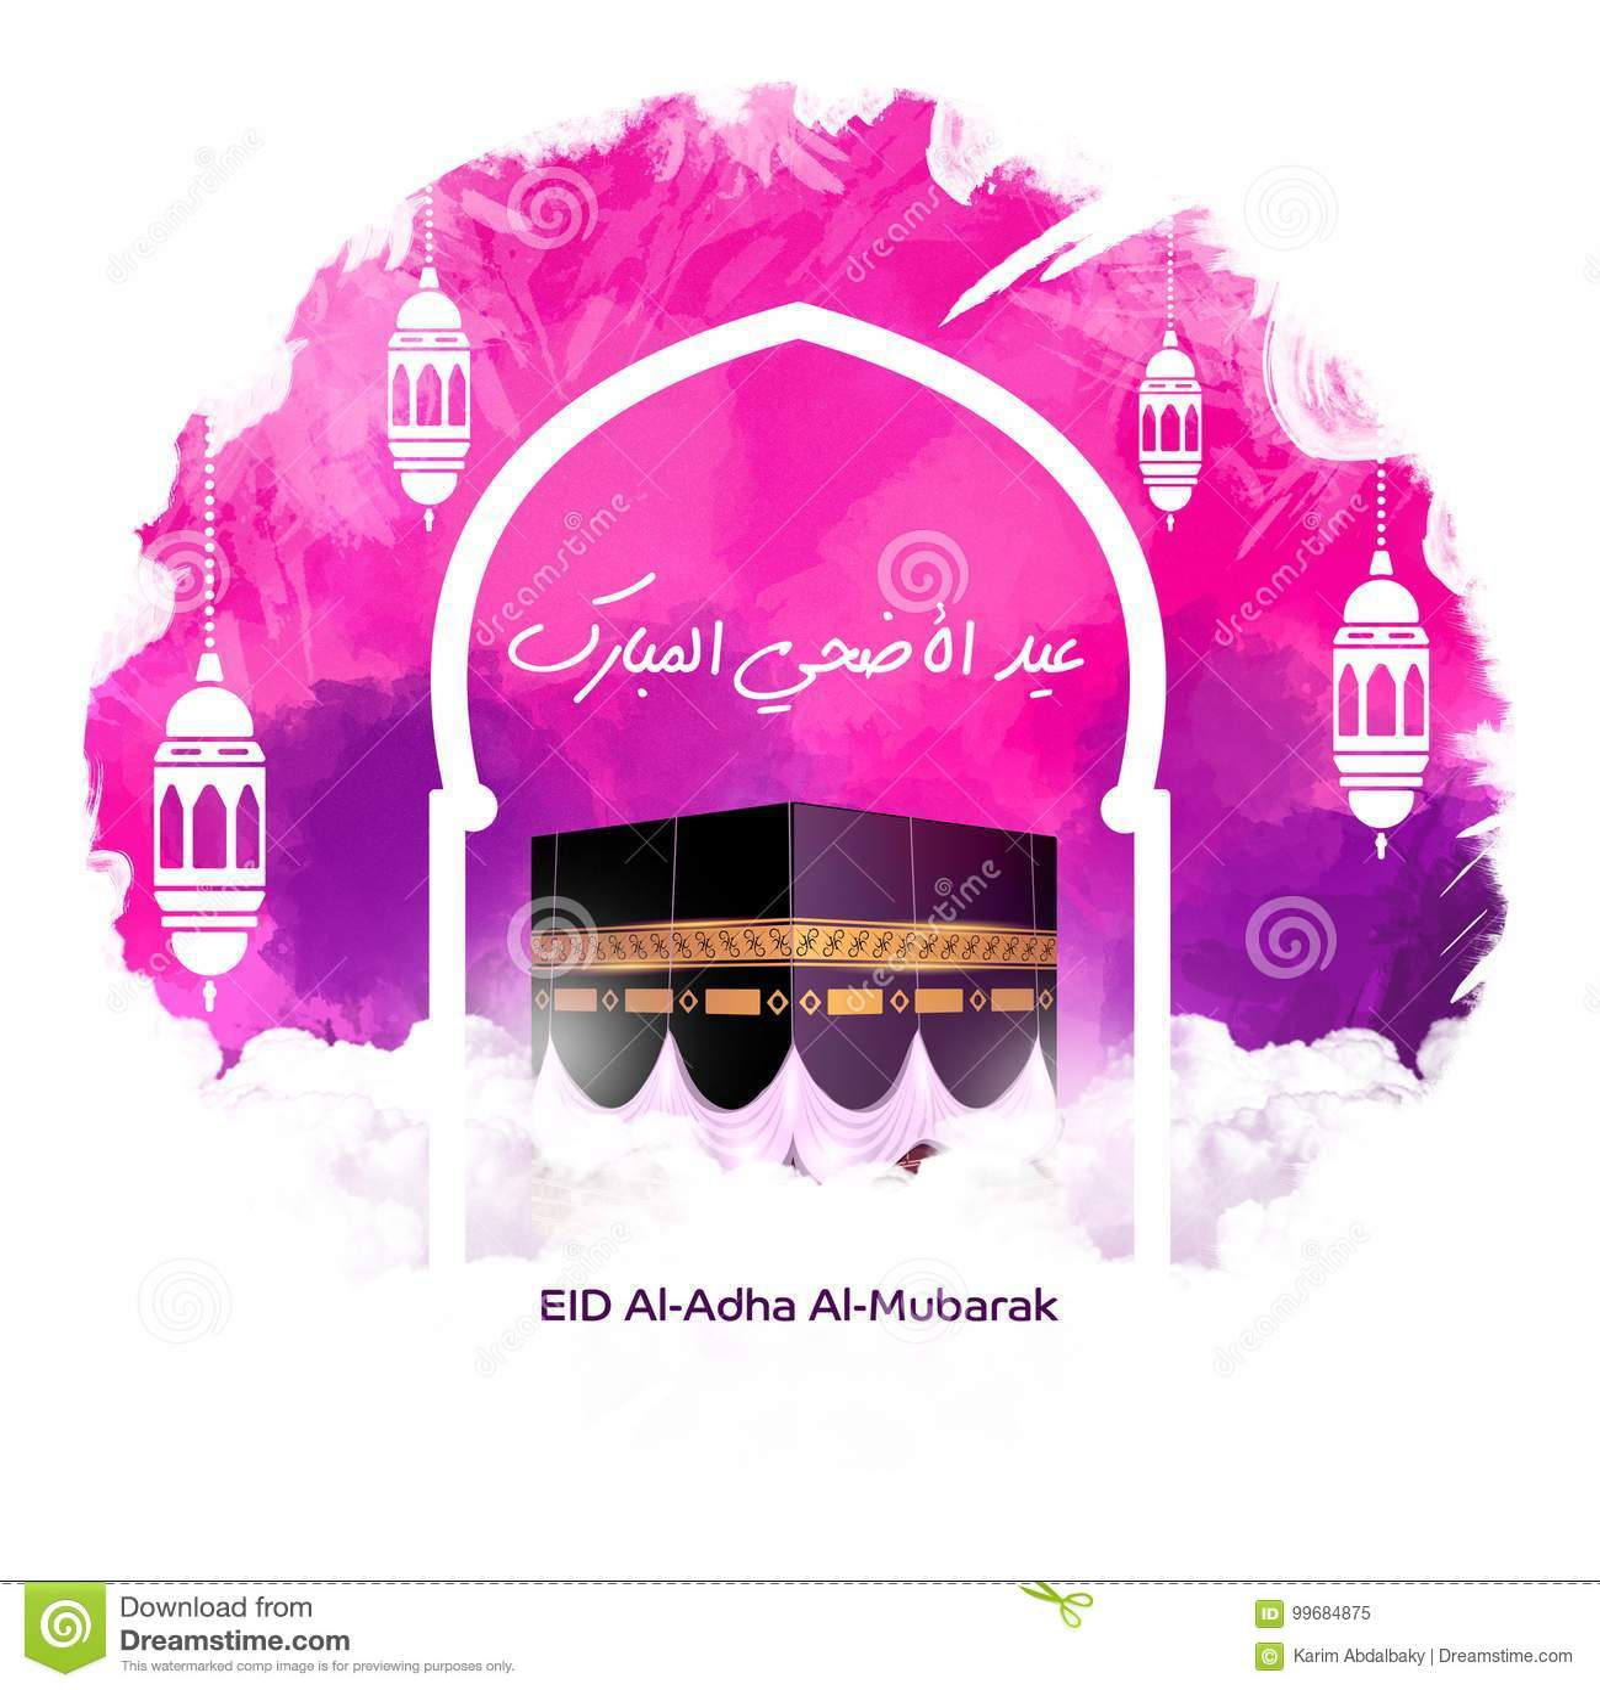 Best Idd Eid Al-Fitr Greeting - arabic-calligraphy-eid-greeting-happy-eid-al-adha-eid-al-fitr-eid-mubarak-arabic-calligraphy-eid-greeting-happy-eid-al-adha-99684875  Photograph_165158 .jpg